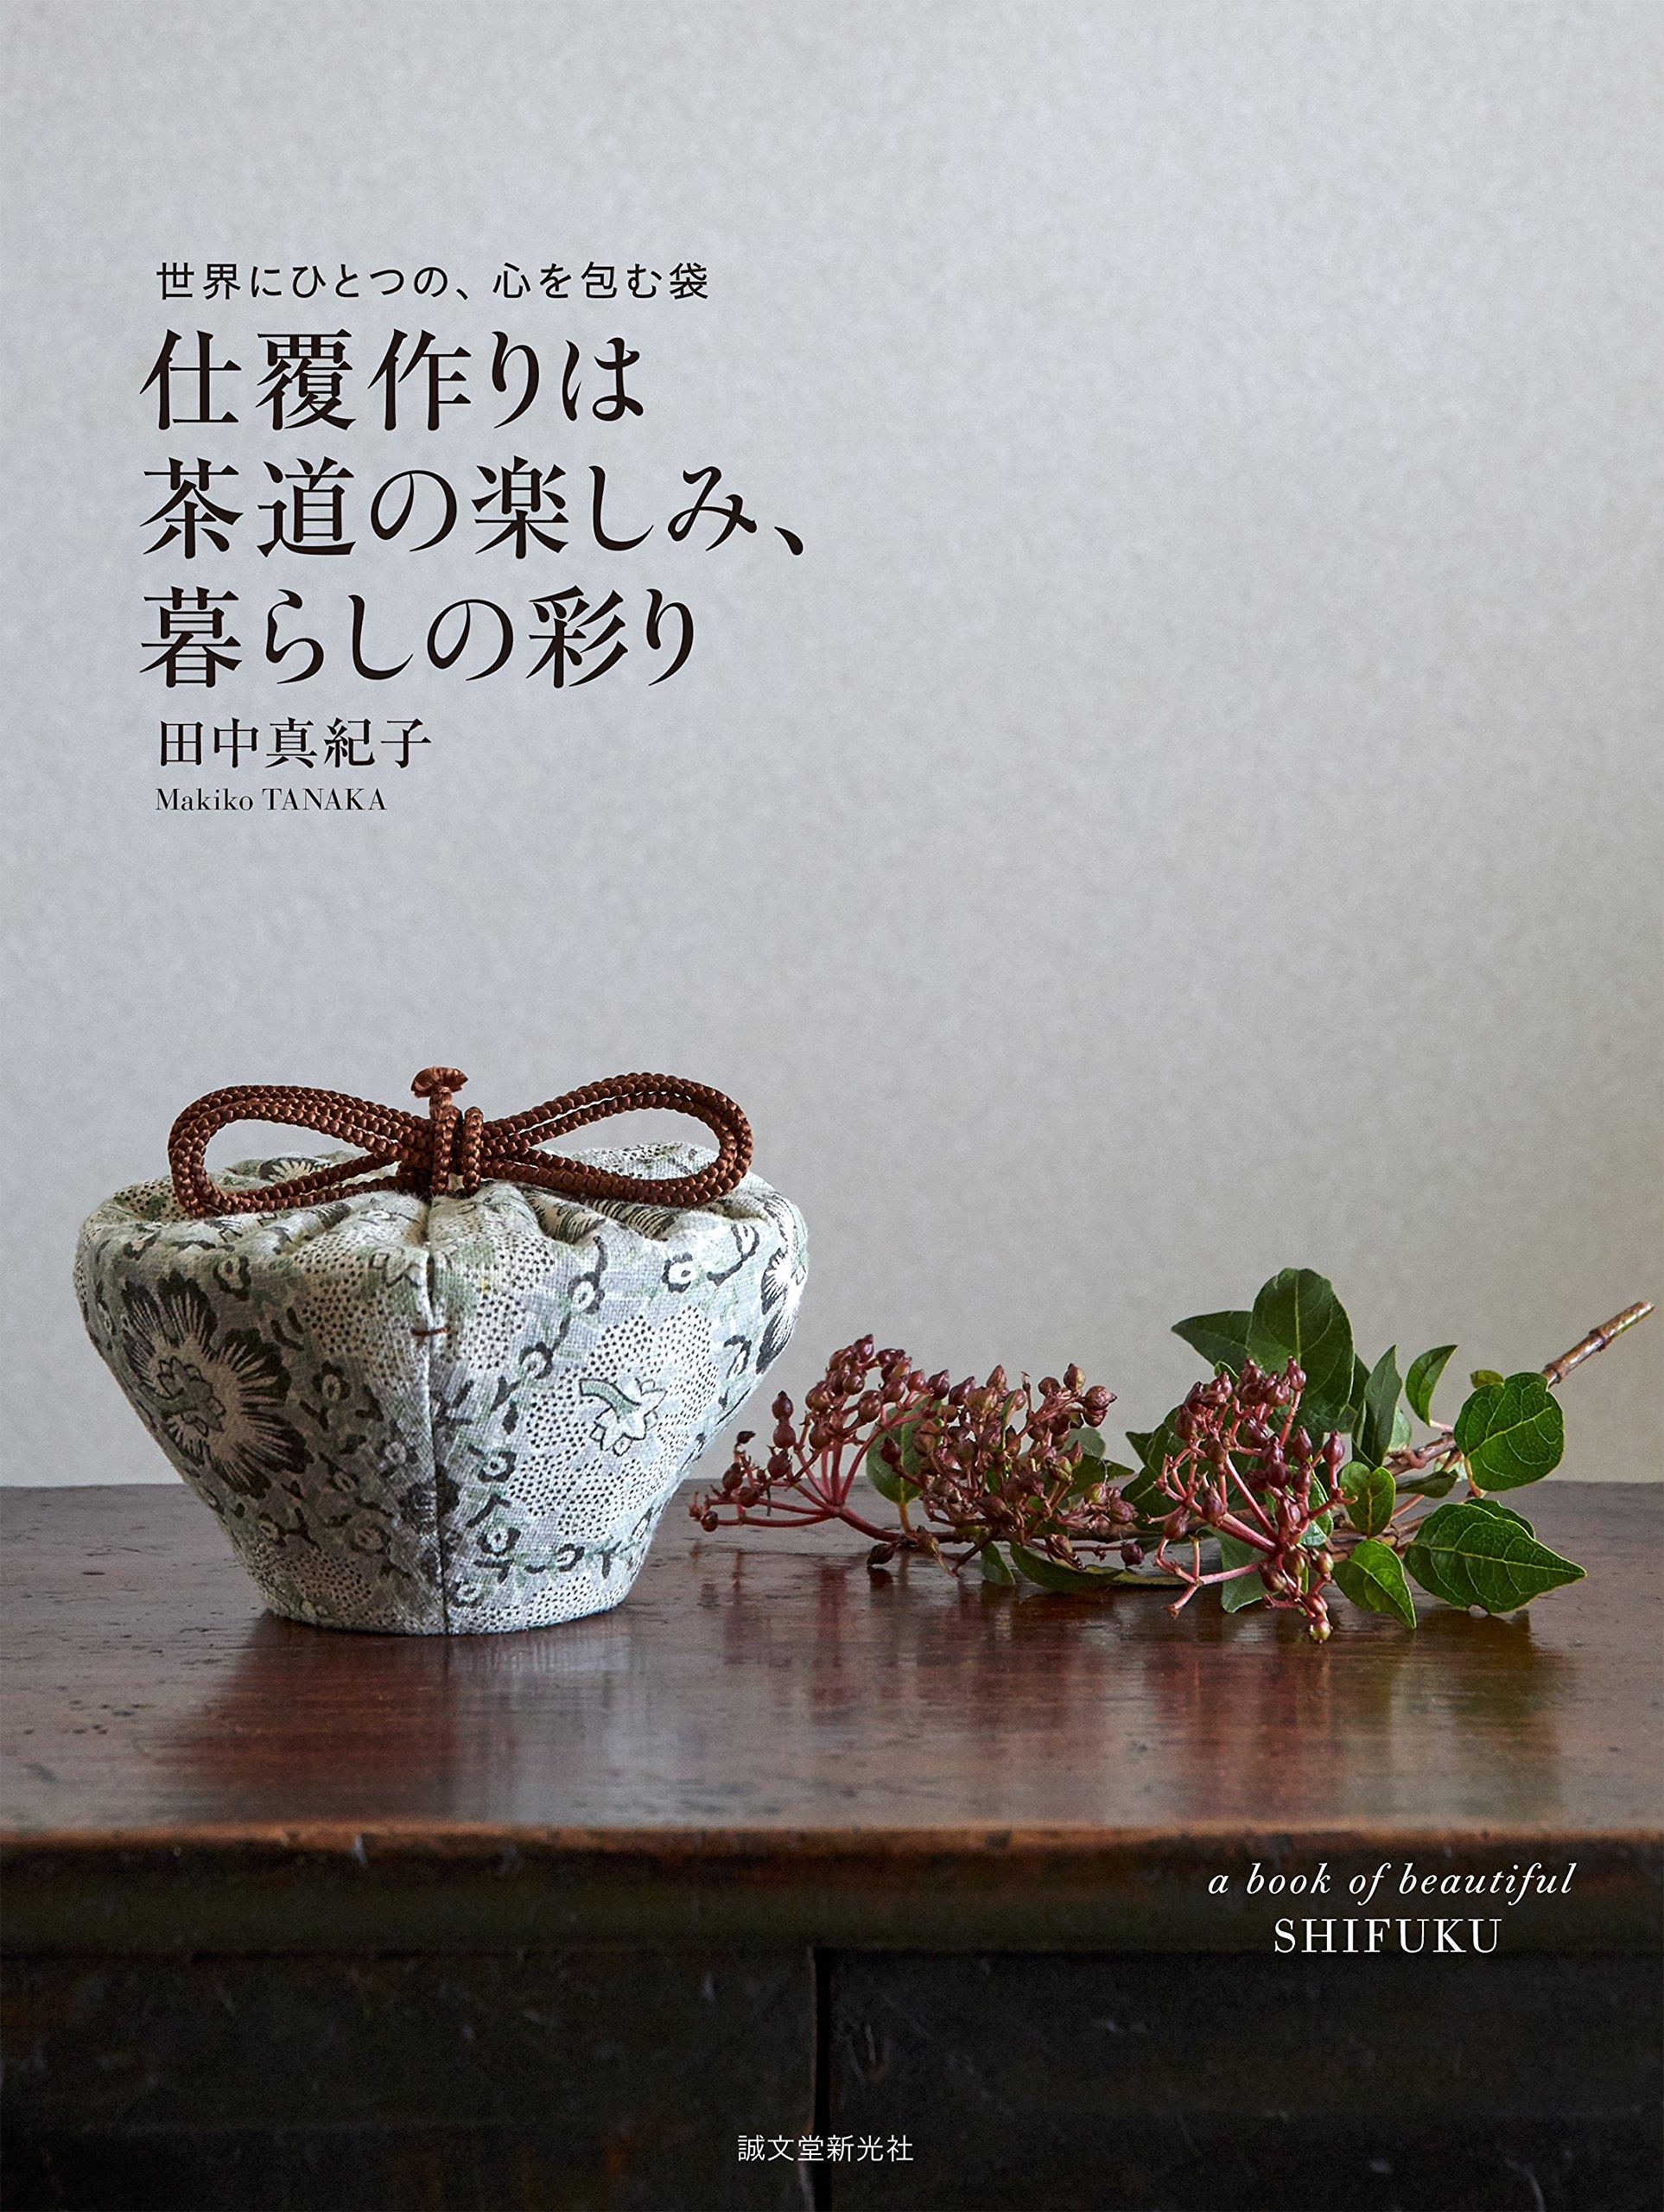 Shifuku Fun, Life Color: Silver Linings, Heart and Wrap Bag